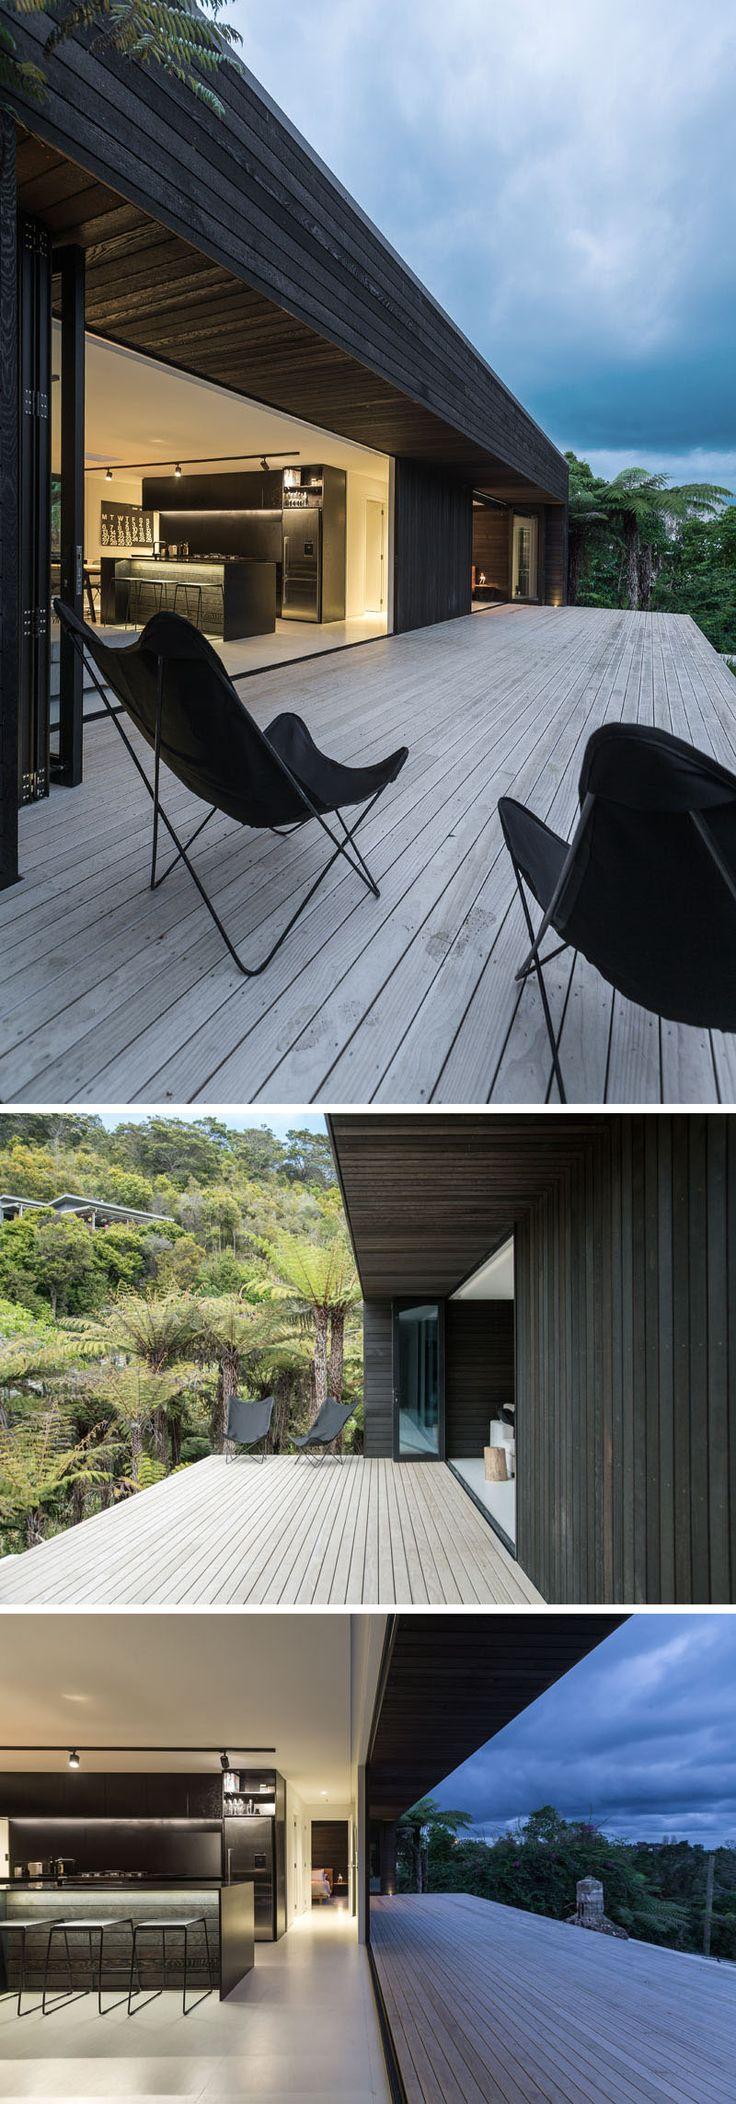 Lake thomas point transitional exterior - The Dark Wood Exterior Of This House Flows Through To The Interior